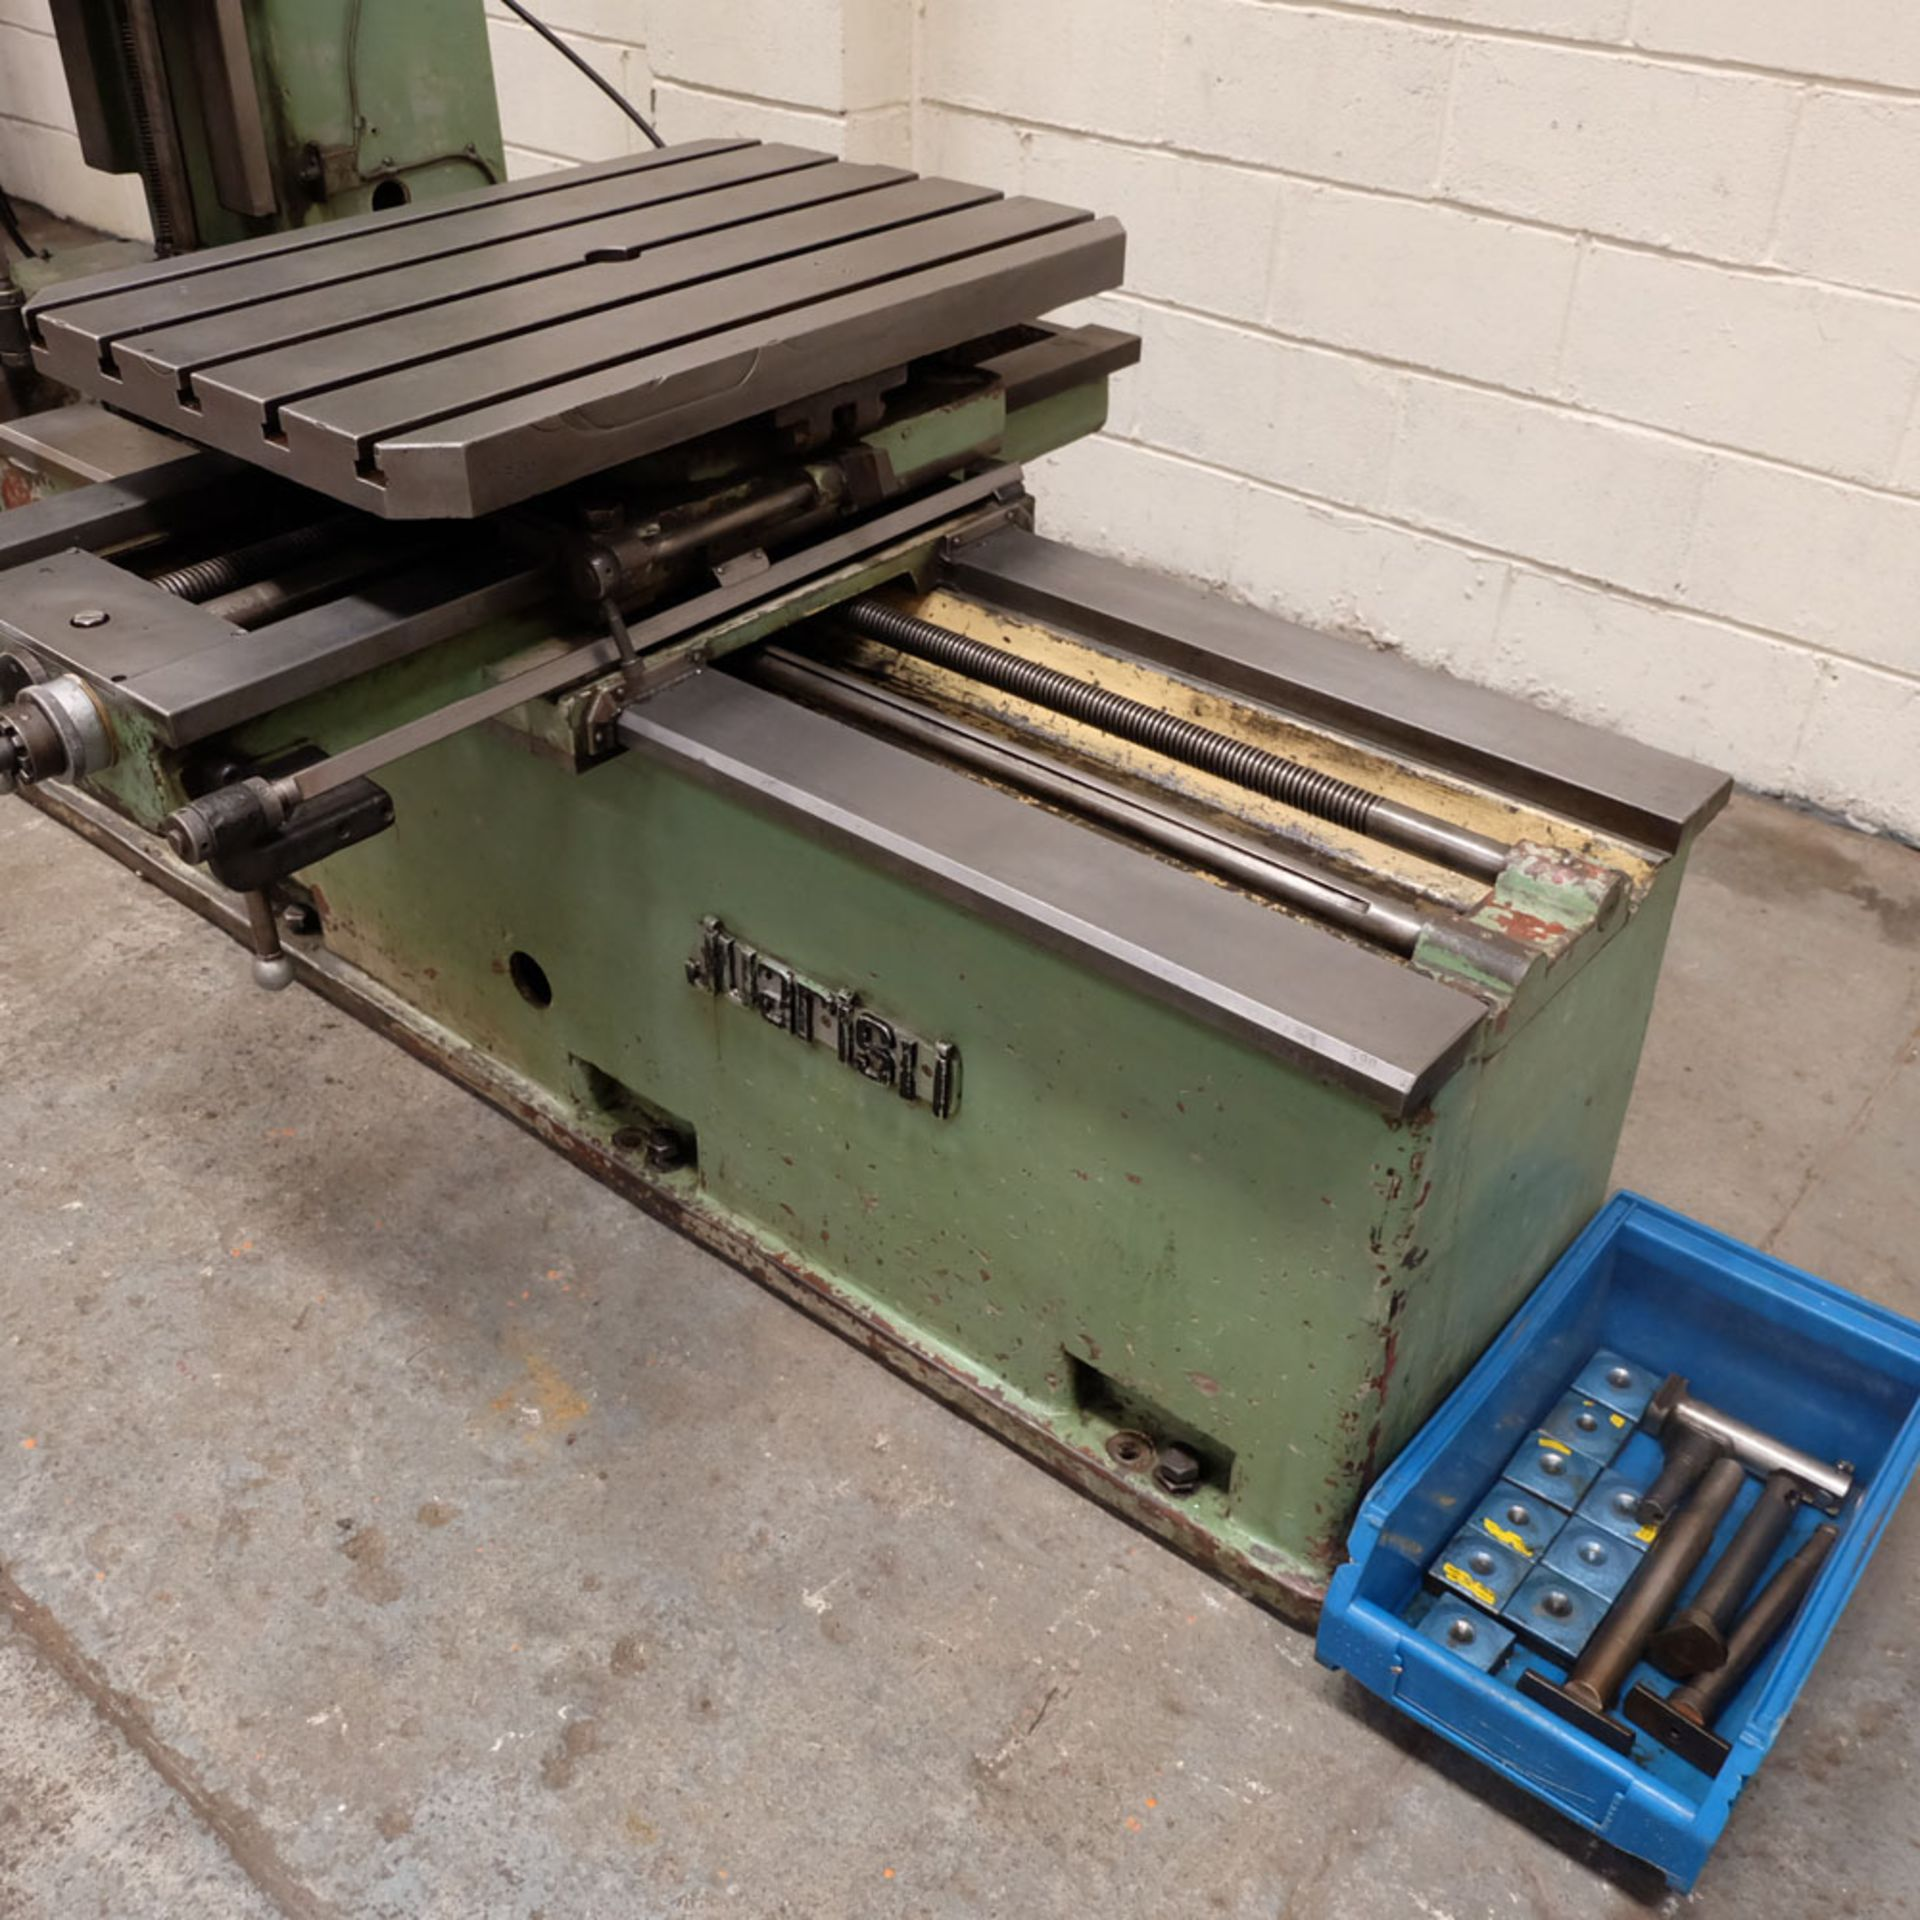 Juaristi Model MDR-55 Horizontal Boring Machine. Spindle Size: 55mm Dia. Spindle Bore: No.4 MT. - Image 5 of 14